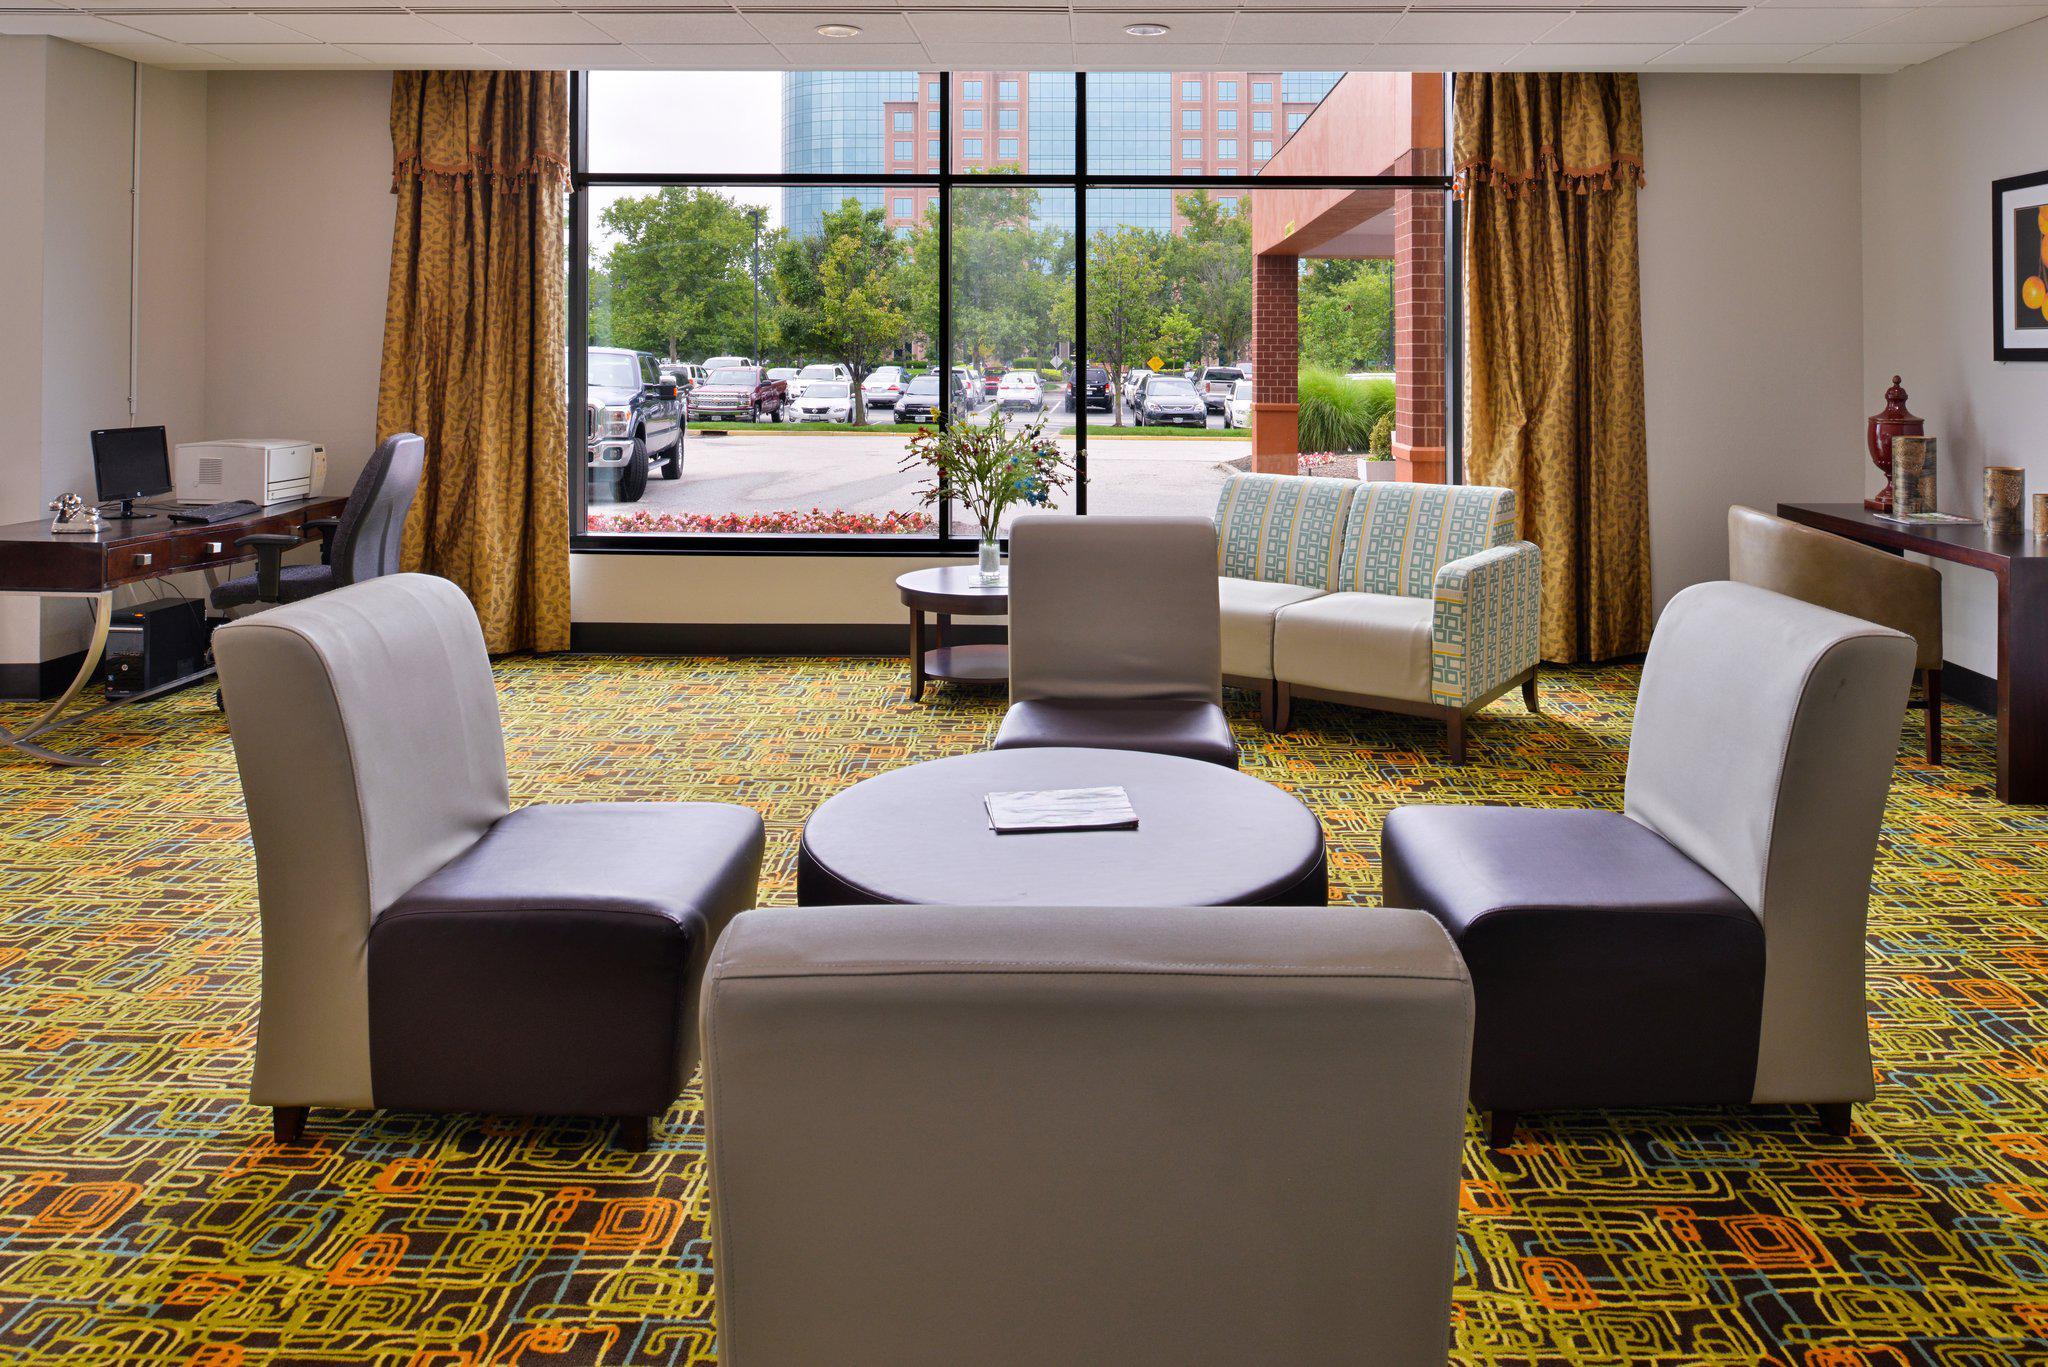 Holiday Inn Express St. Louis Airport- Riverport